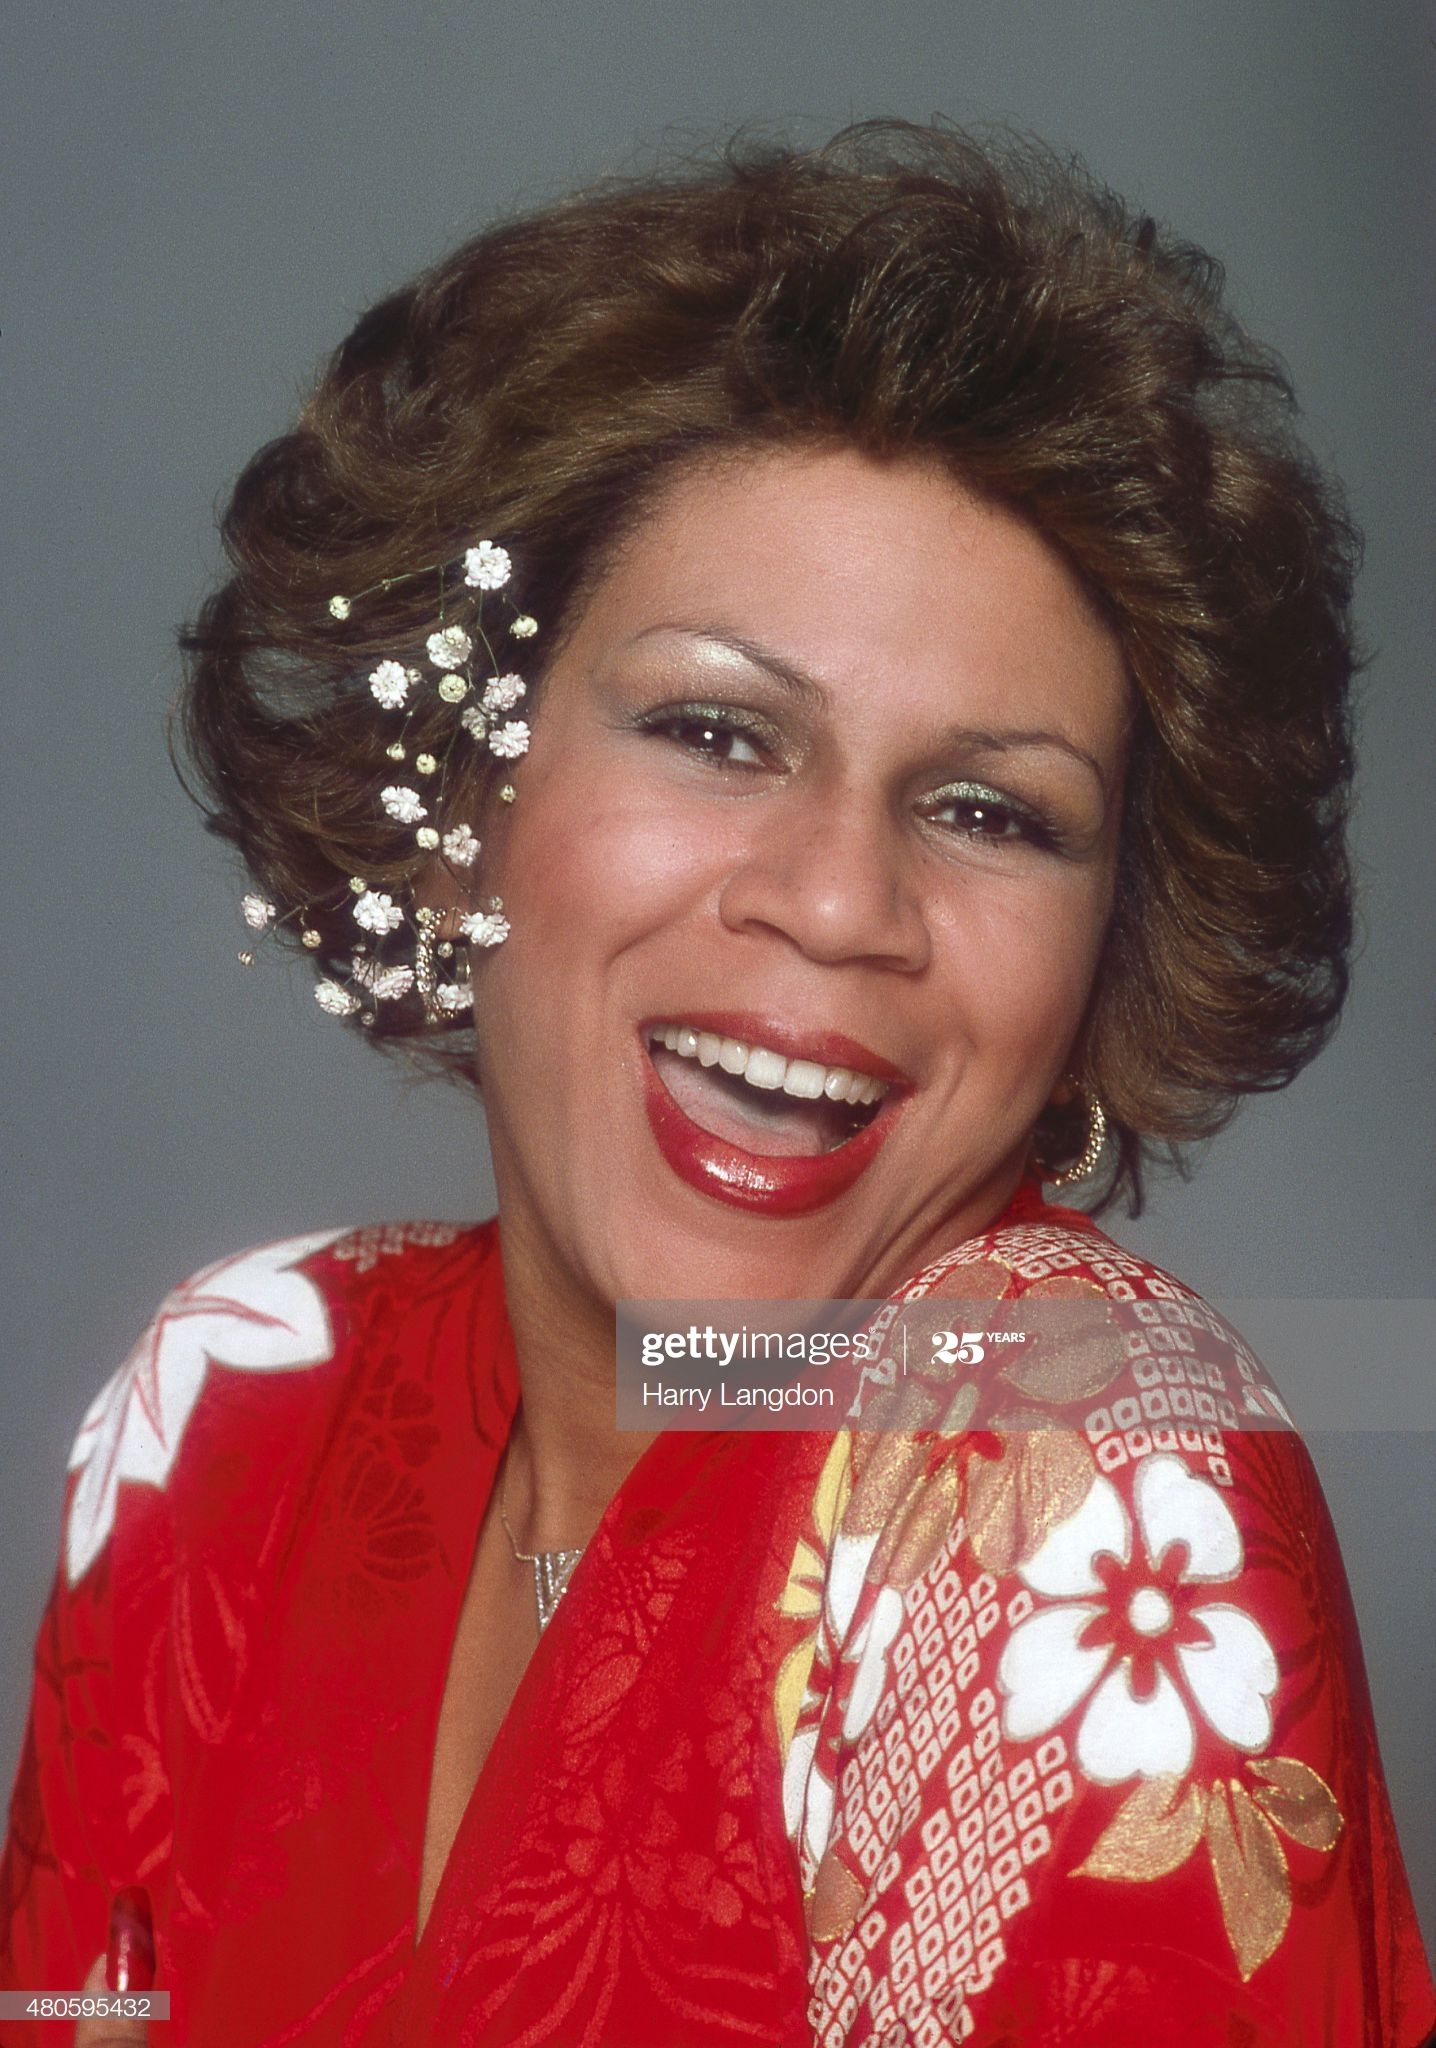 Singer Minnie Riperton poses for a portrait in 1977 in Los